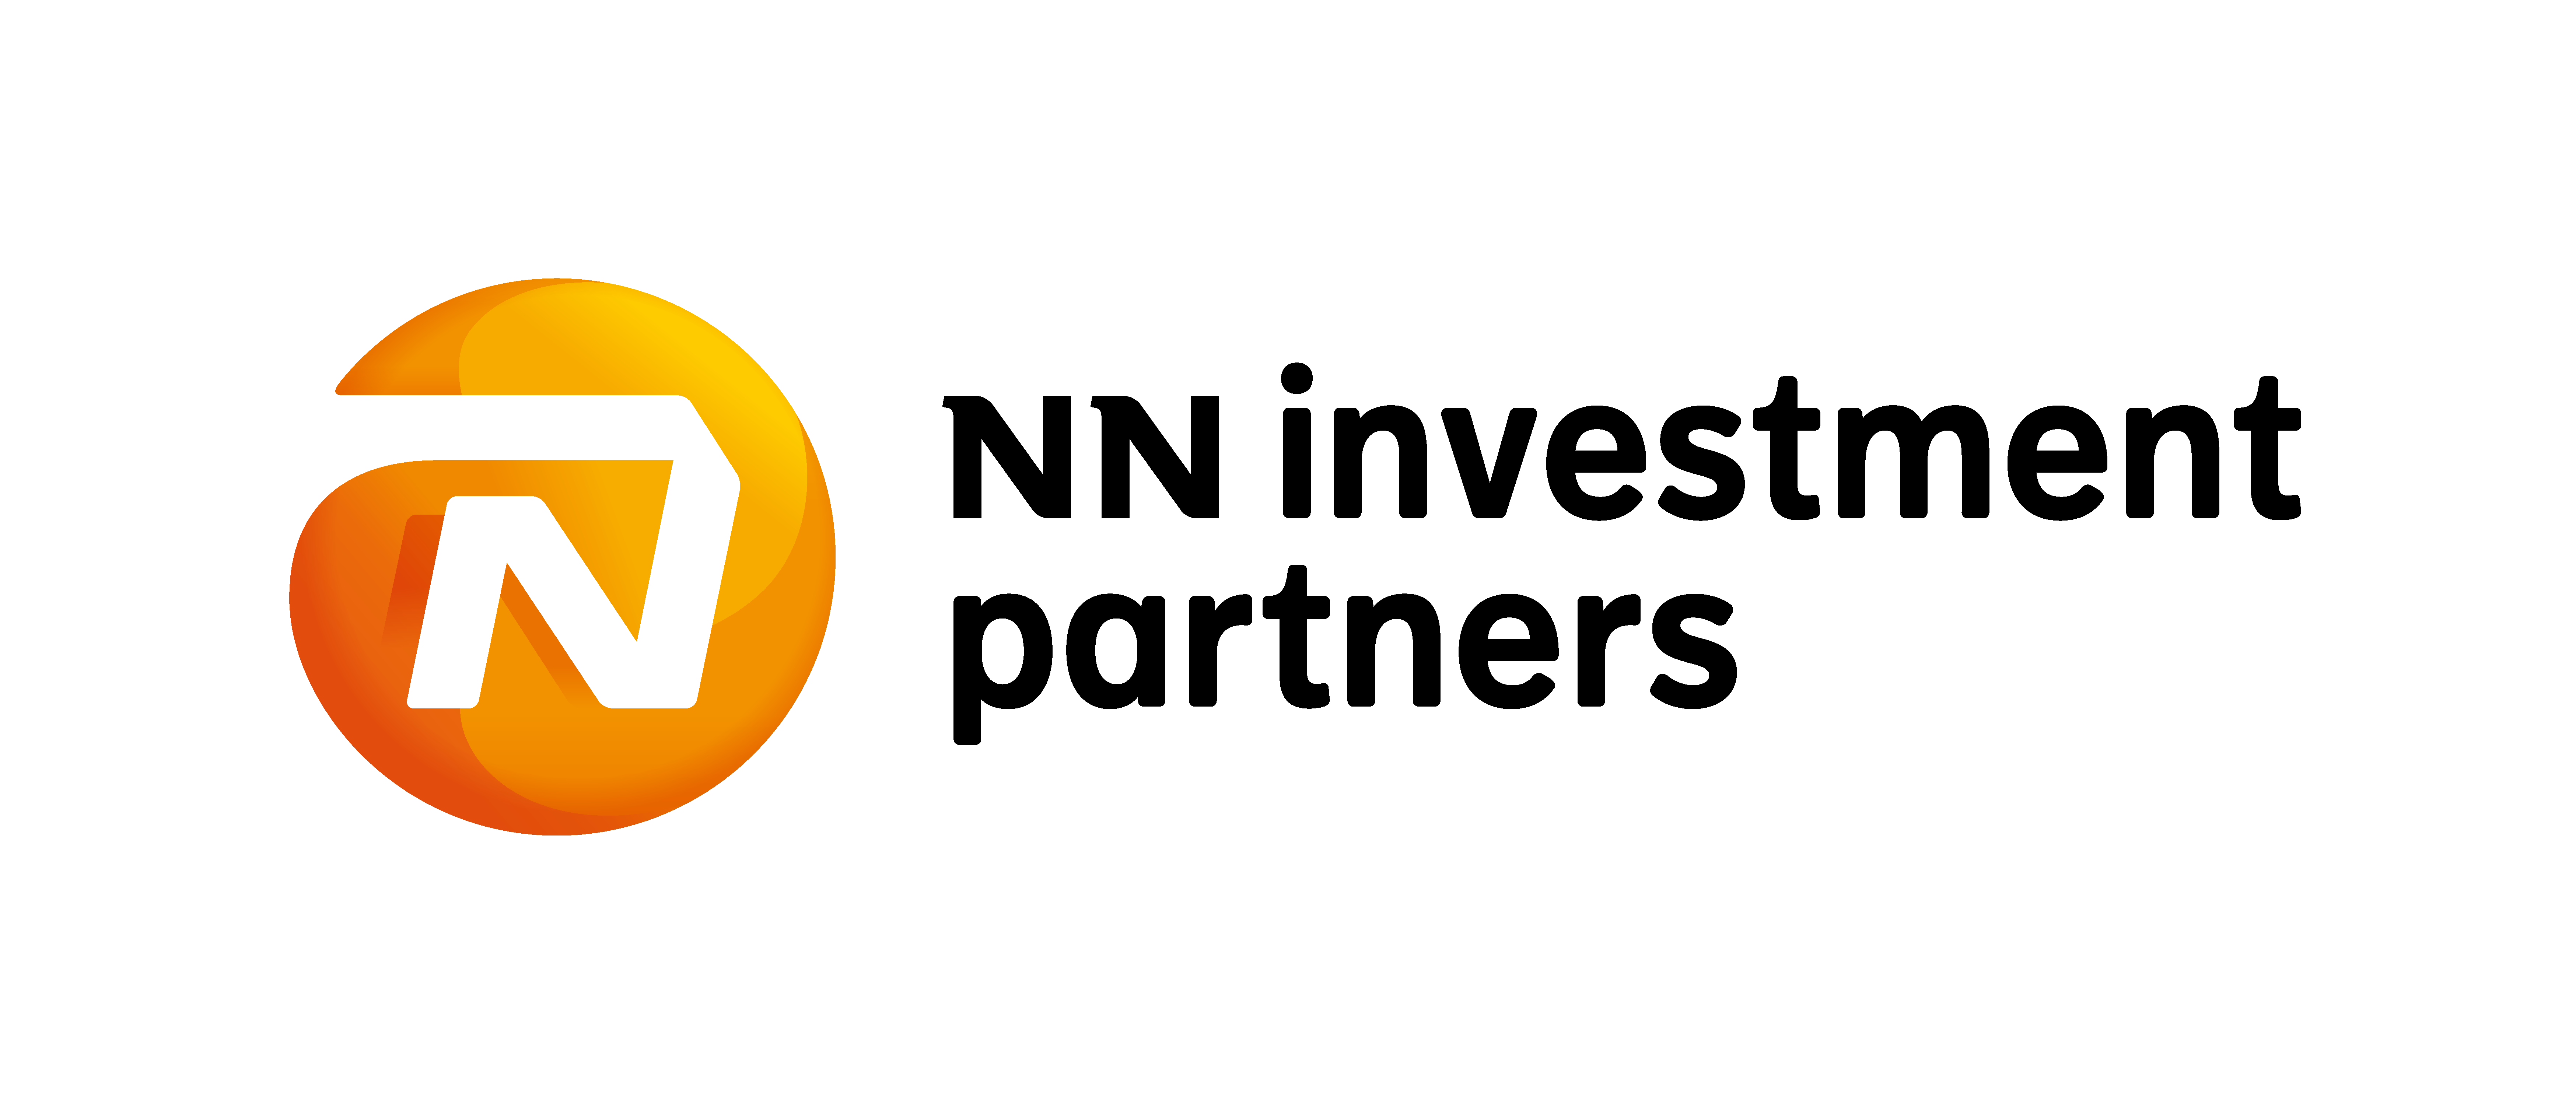 NN_Inv_Partners_v1.2_logo_01_rgb_fc_2400